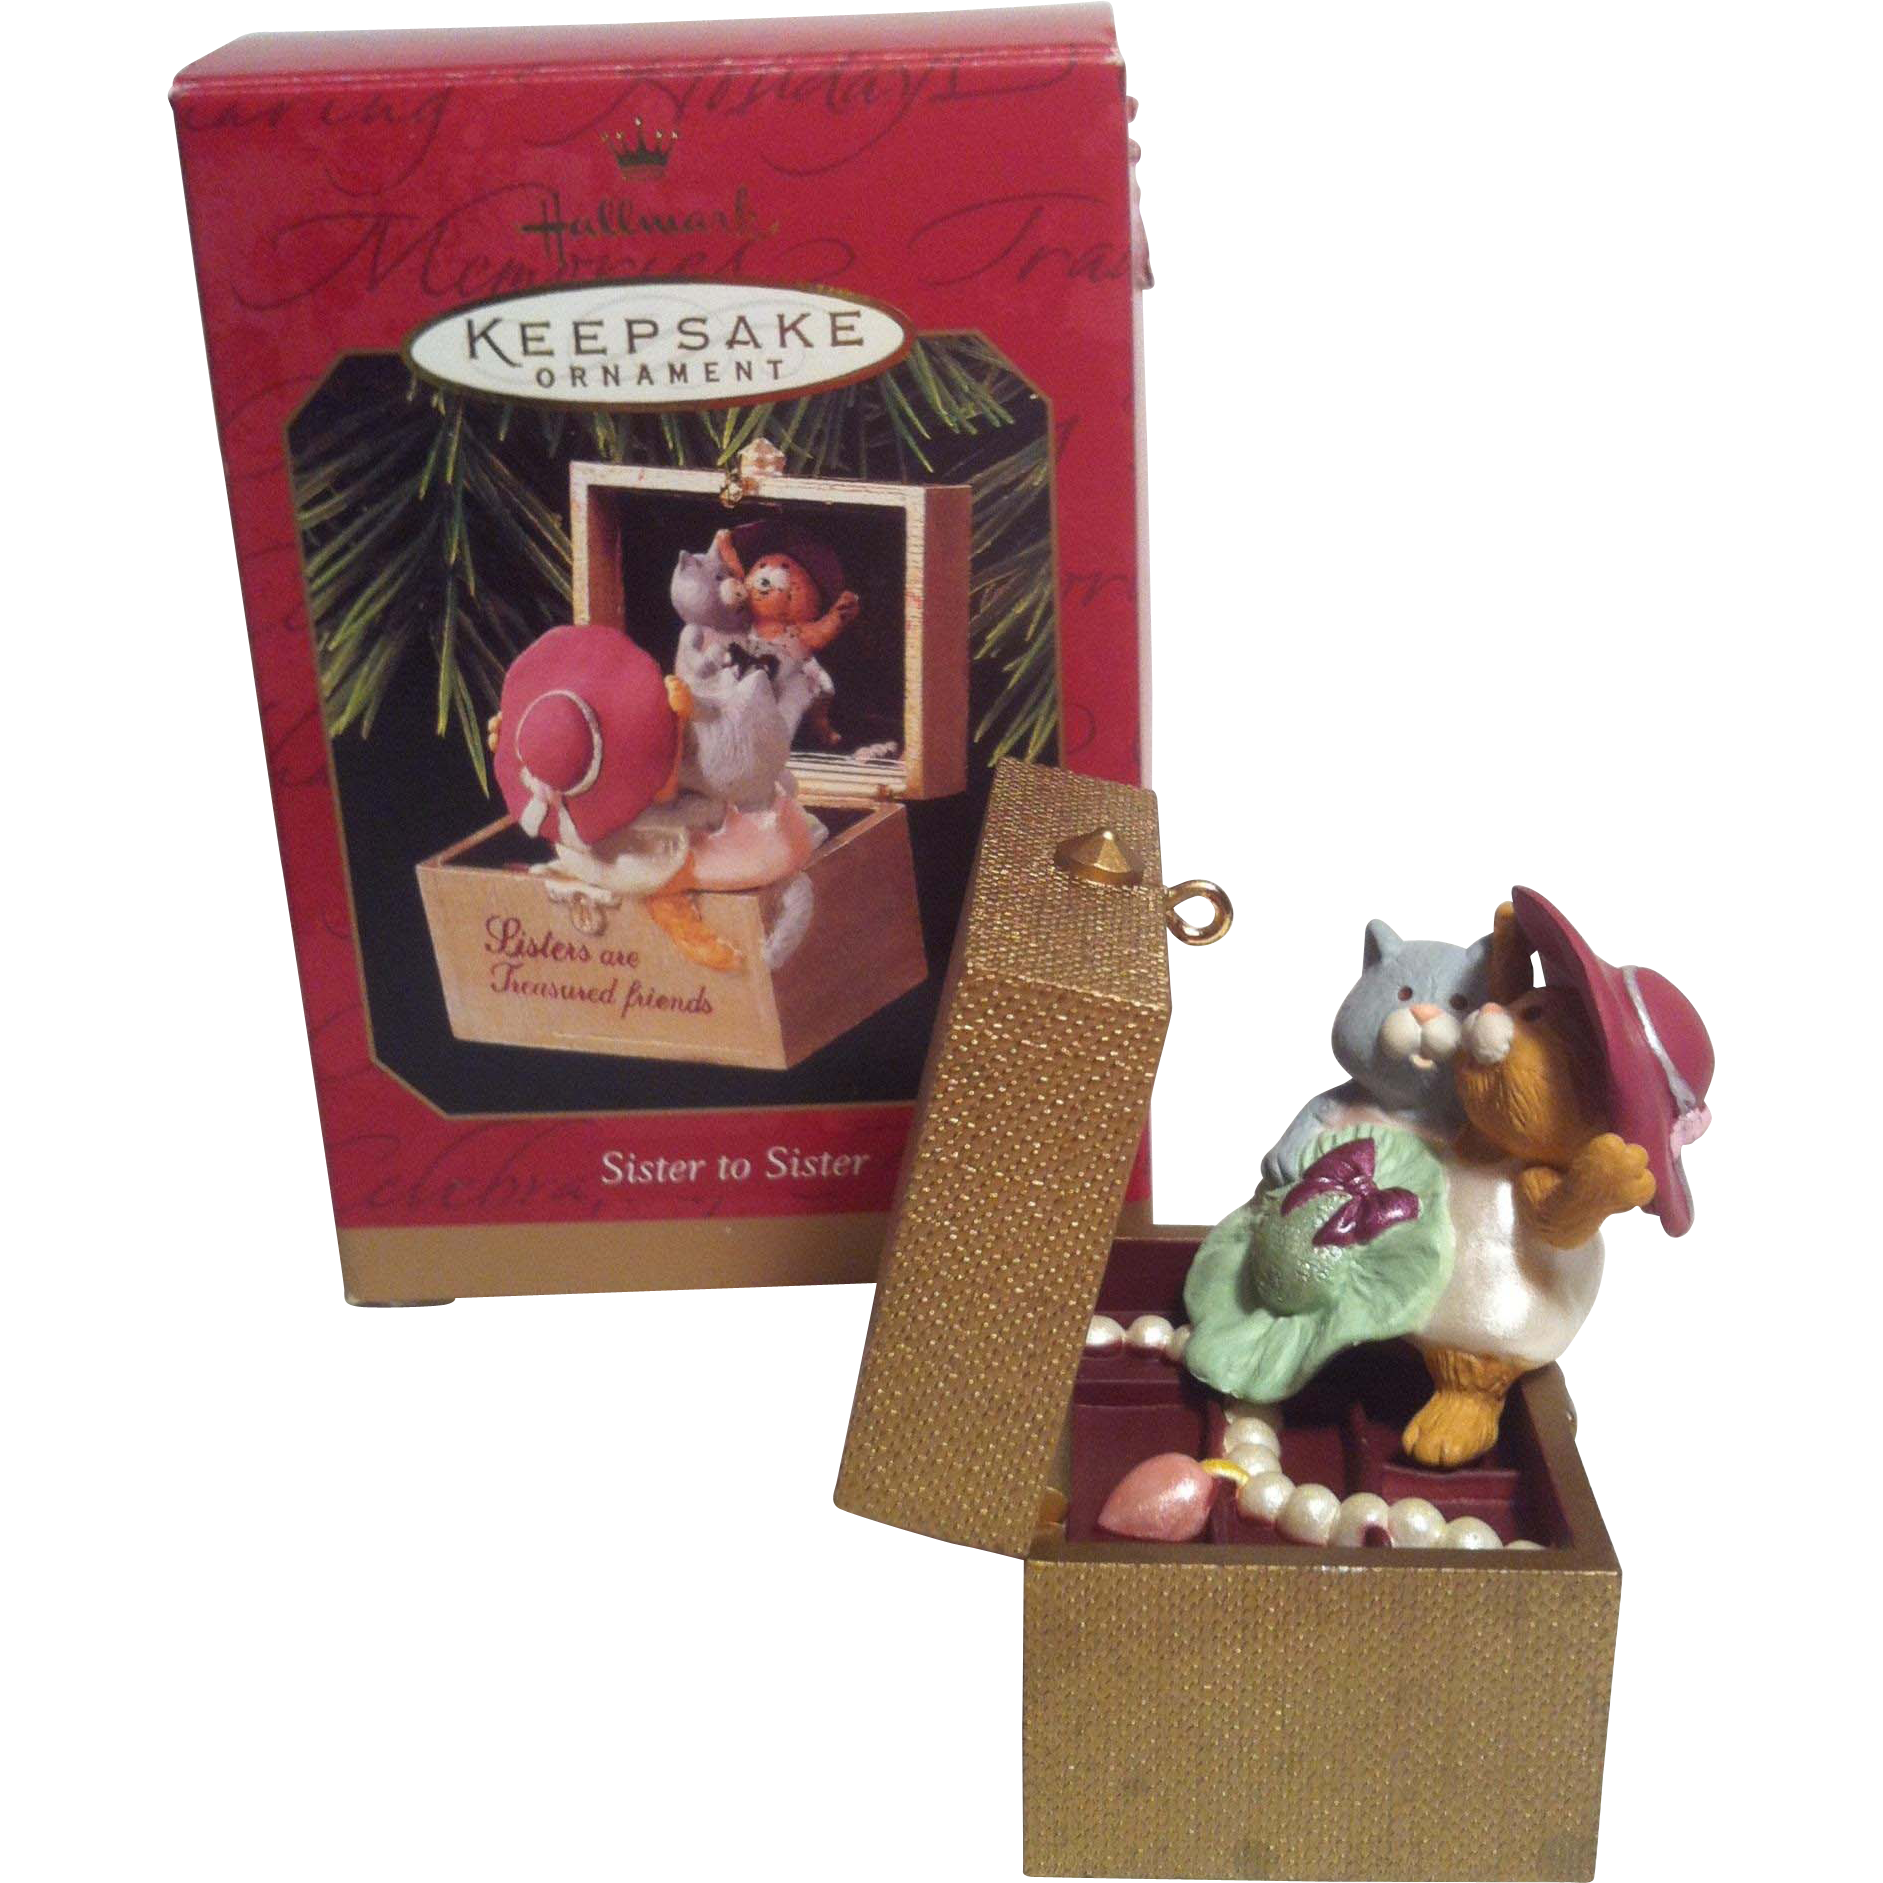 1997 Hallmark Sister to sister Ornament